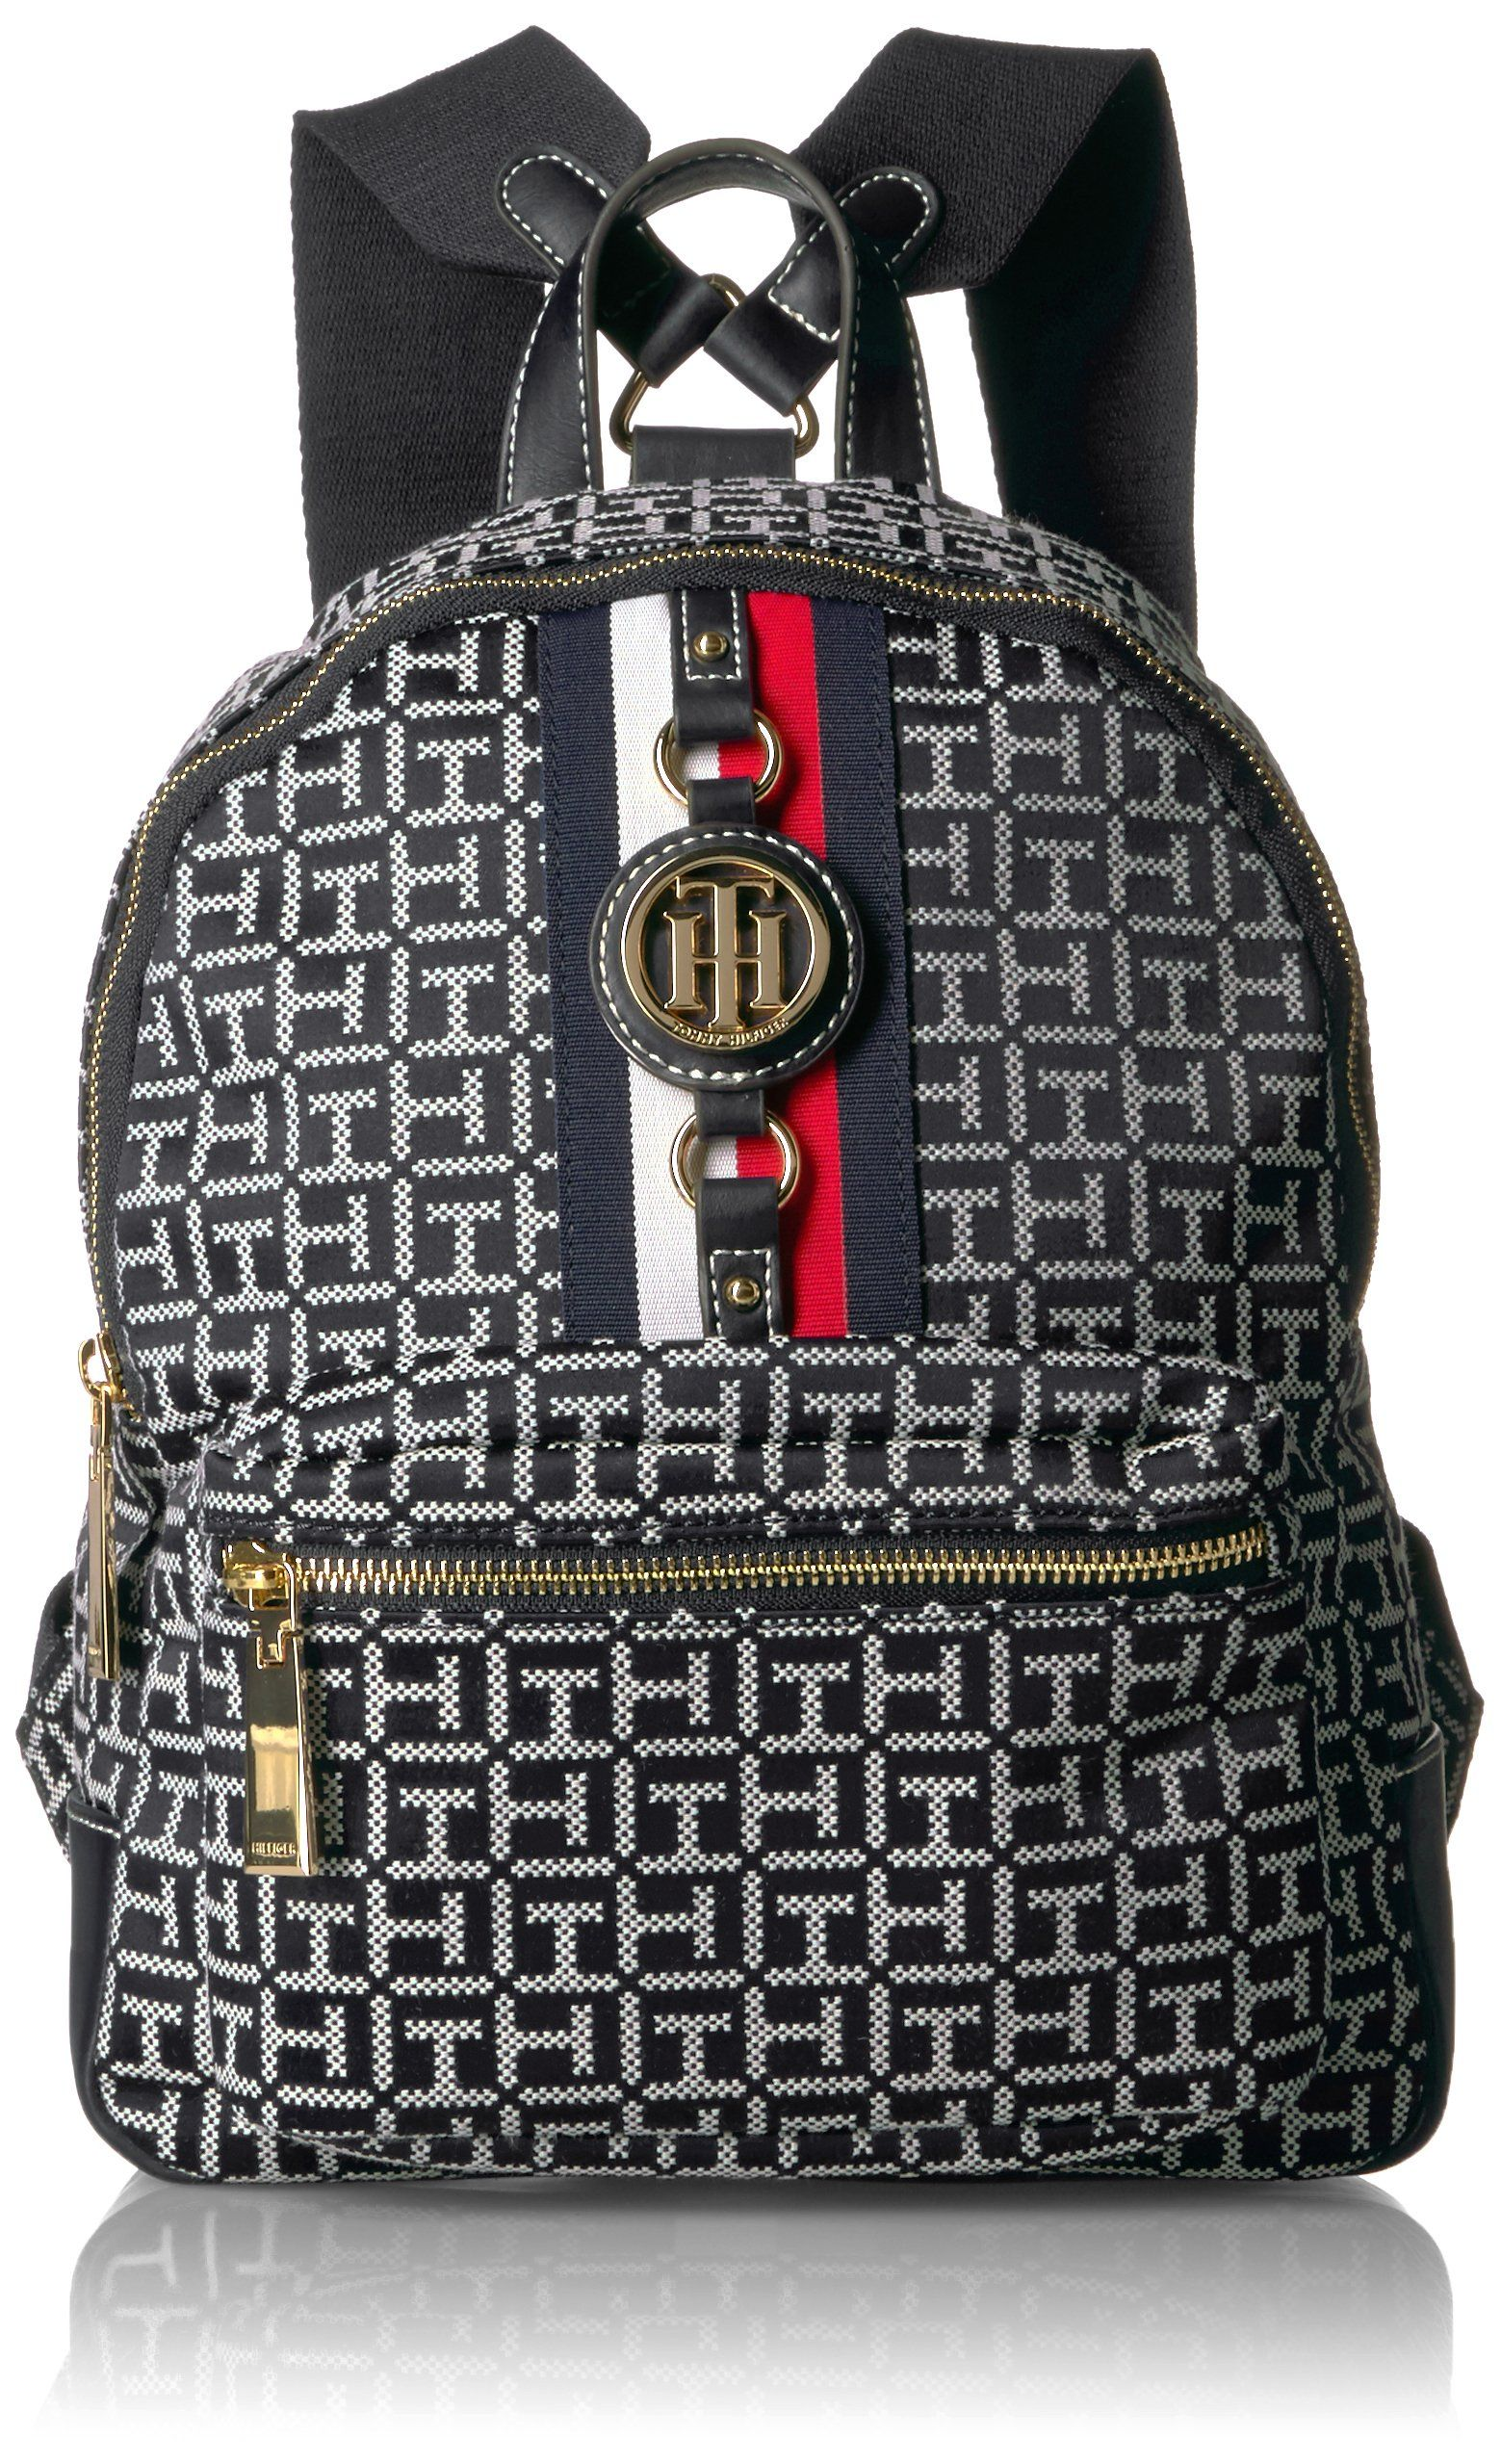 Tommy Hilfiger Women S Backpack Jaden Black White Amazone Vetements Hero Academia